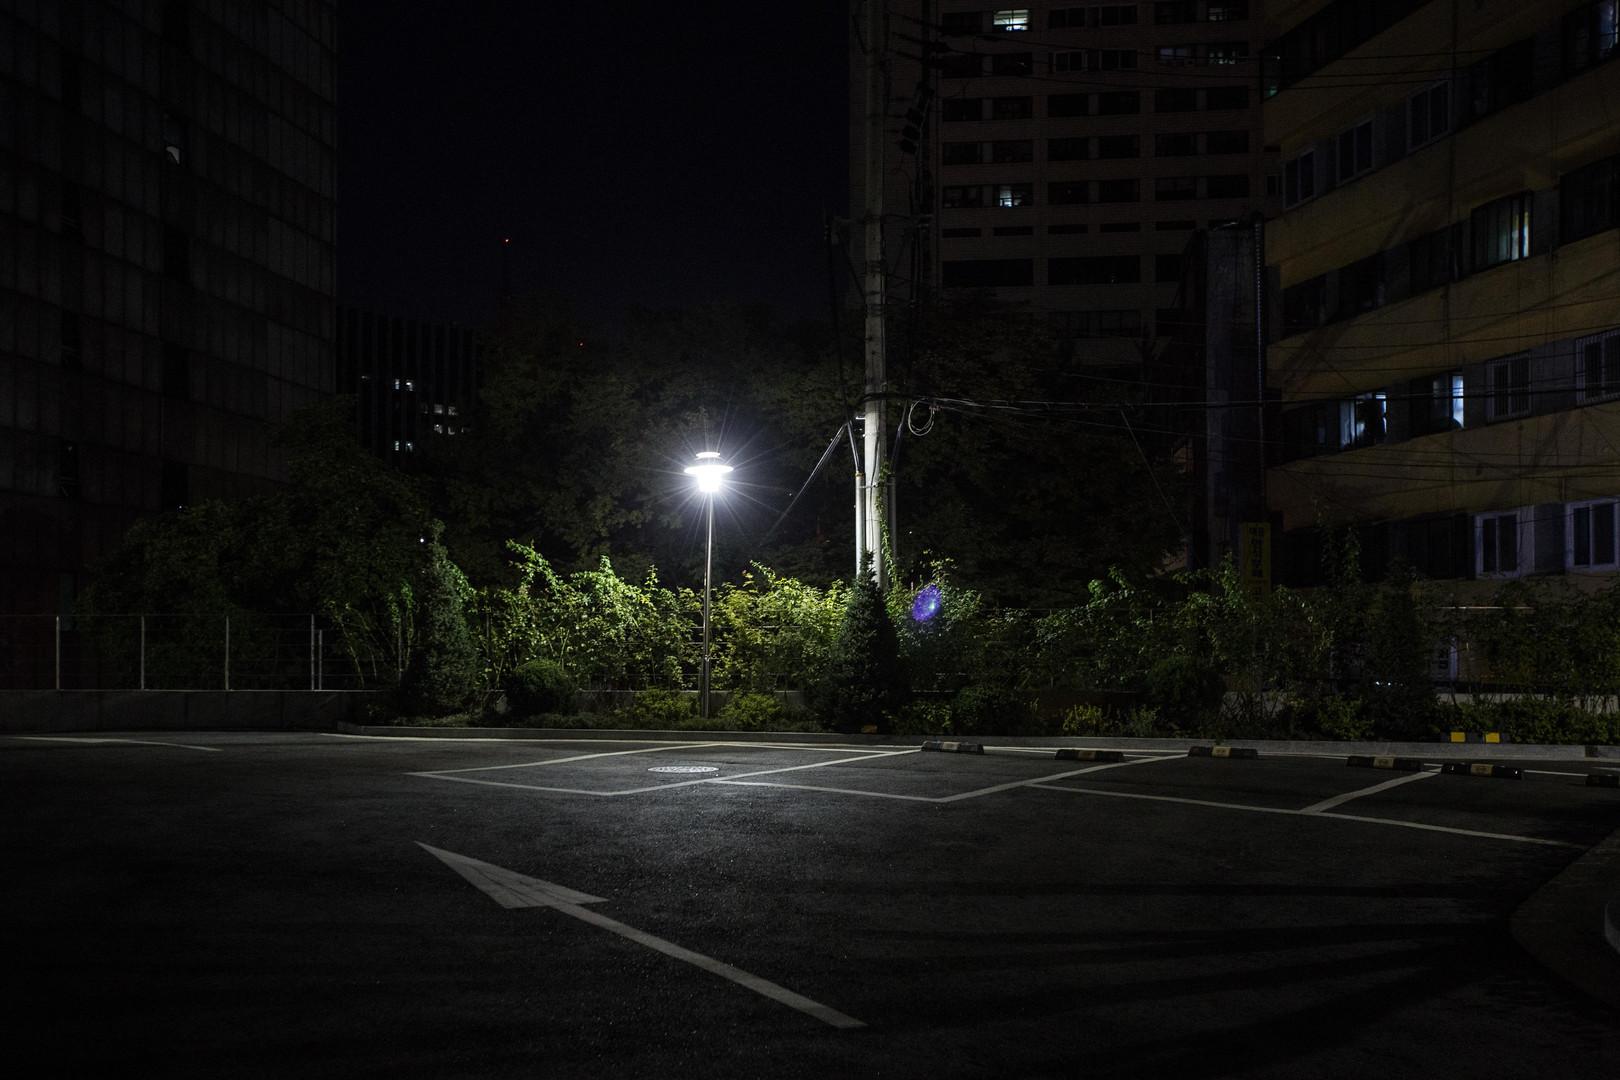 seoul street night #5